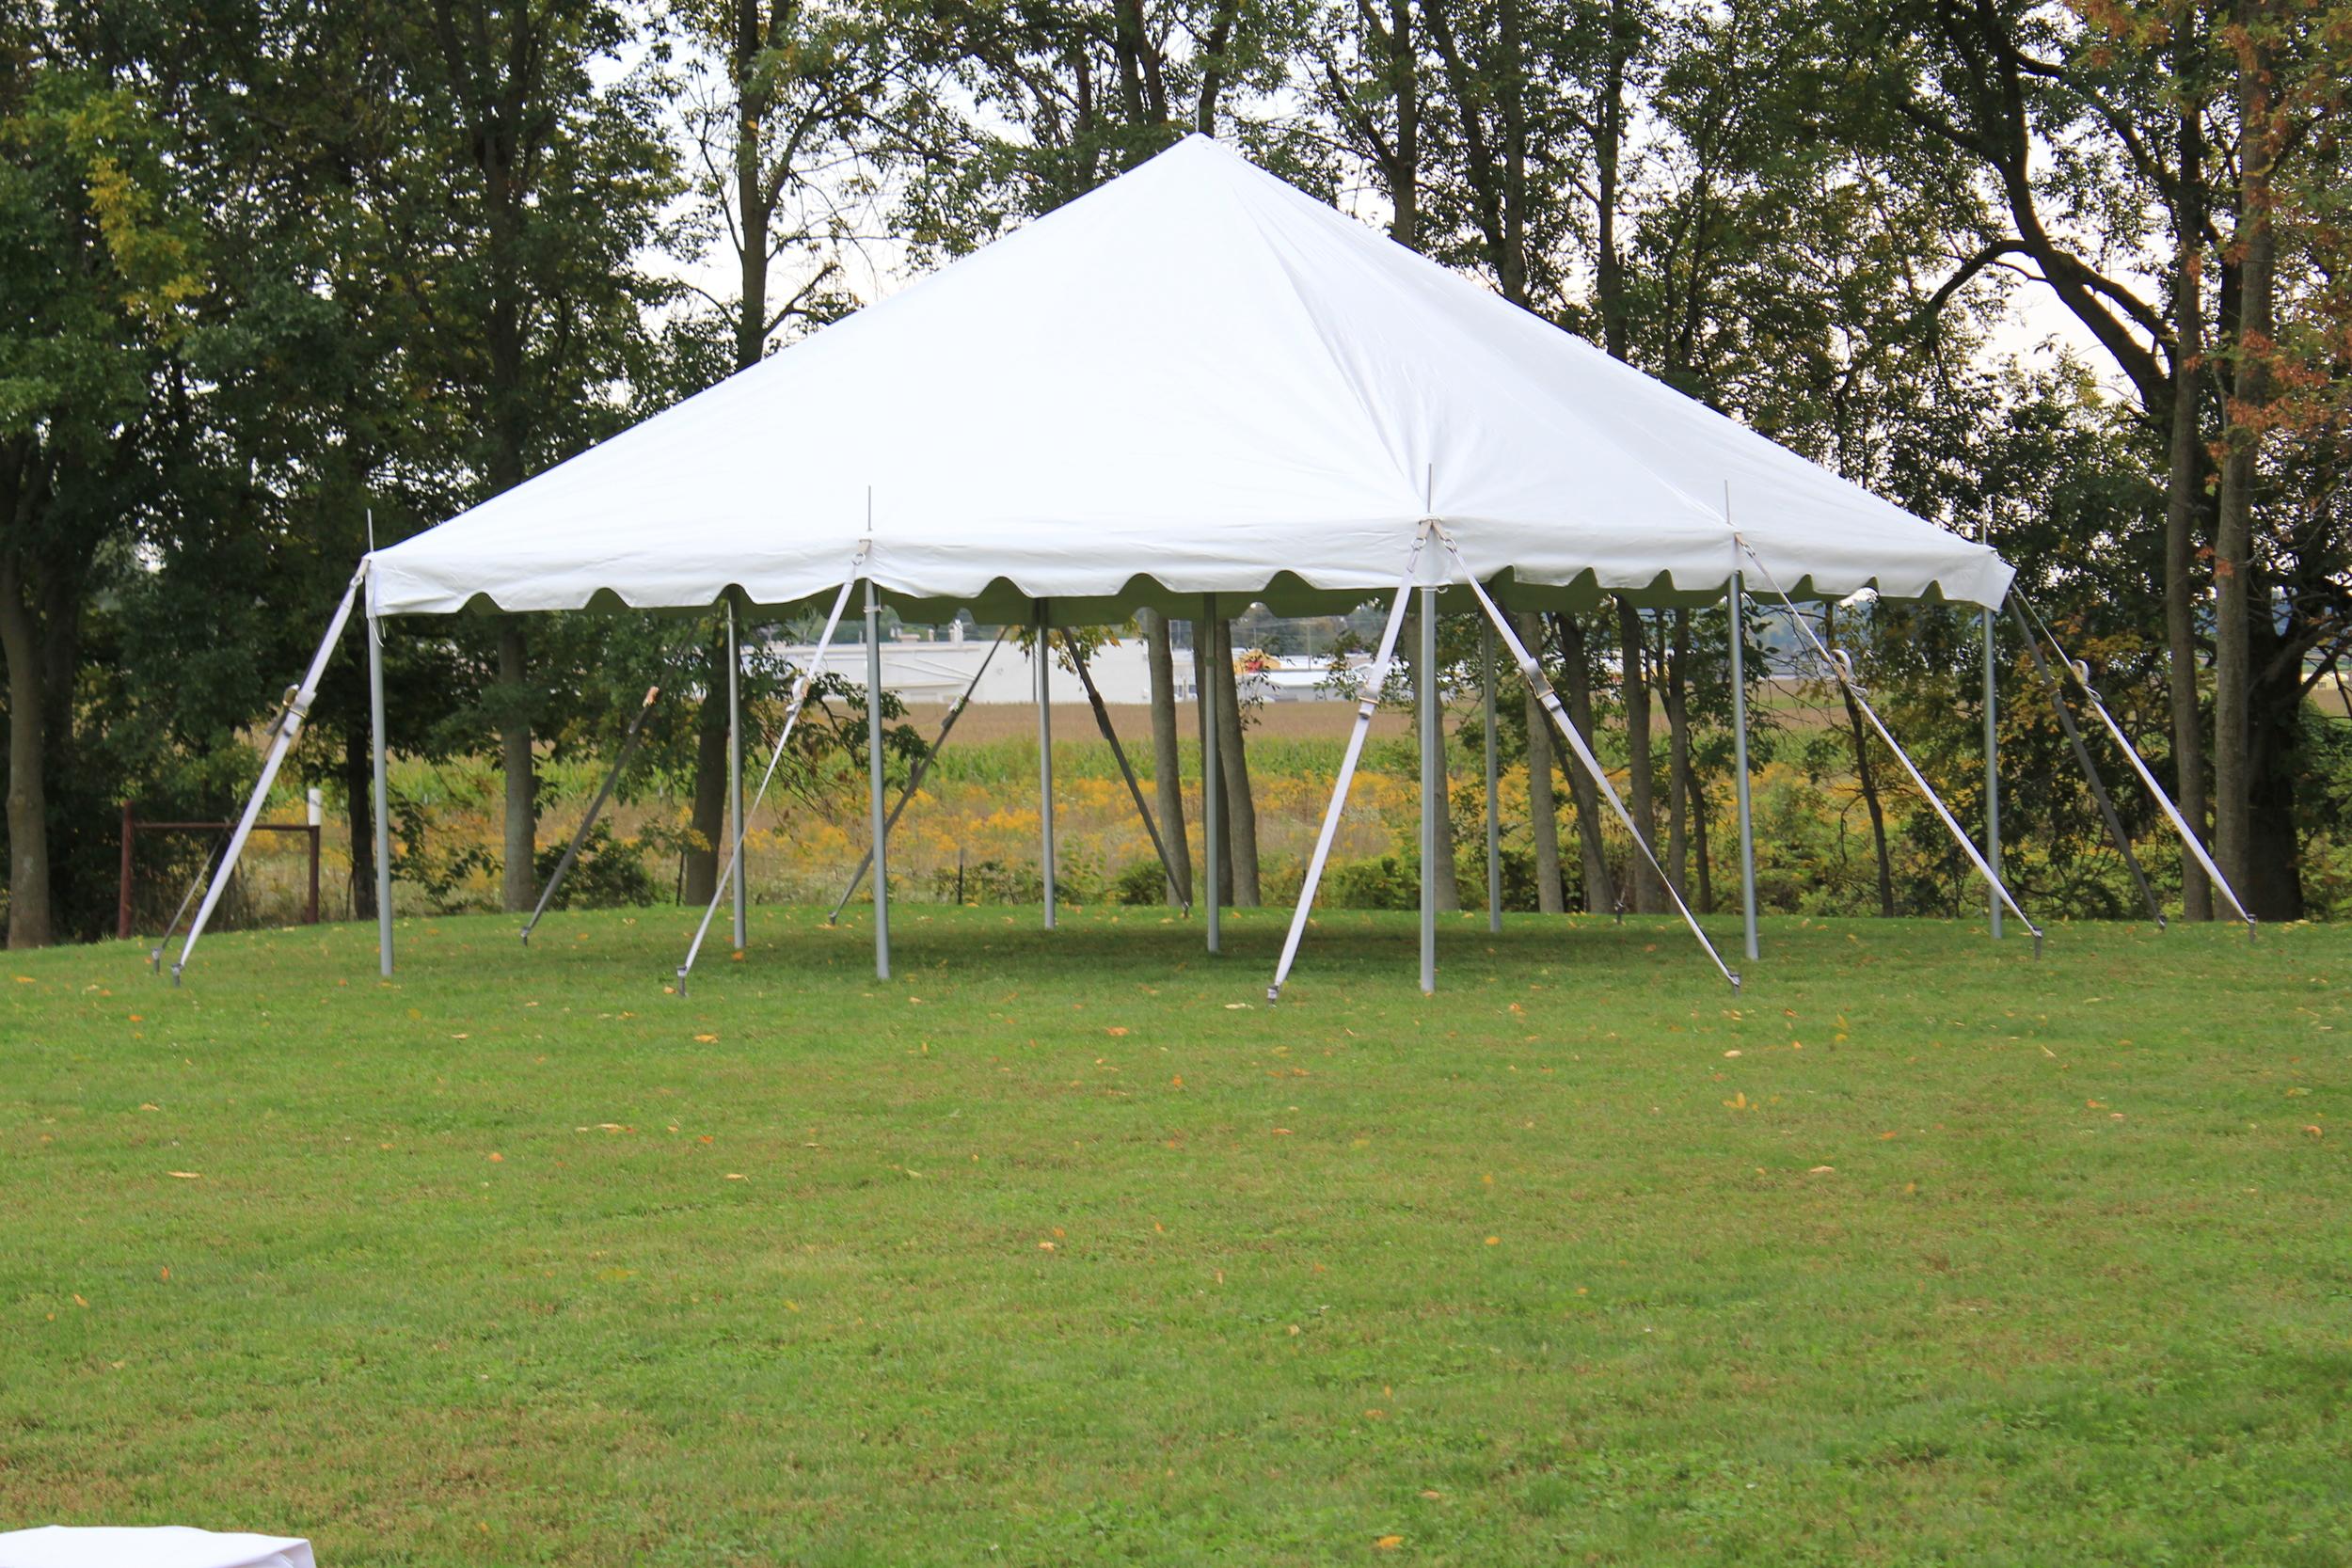 20' x 20' Pole Tent White (3).JPG